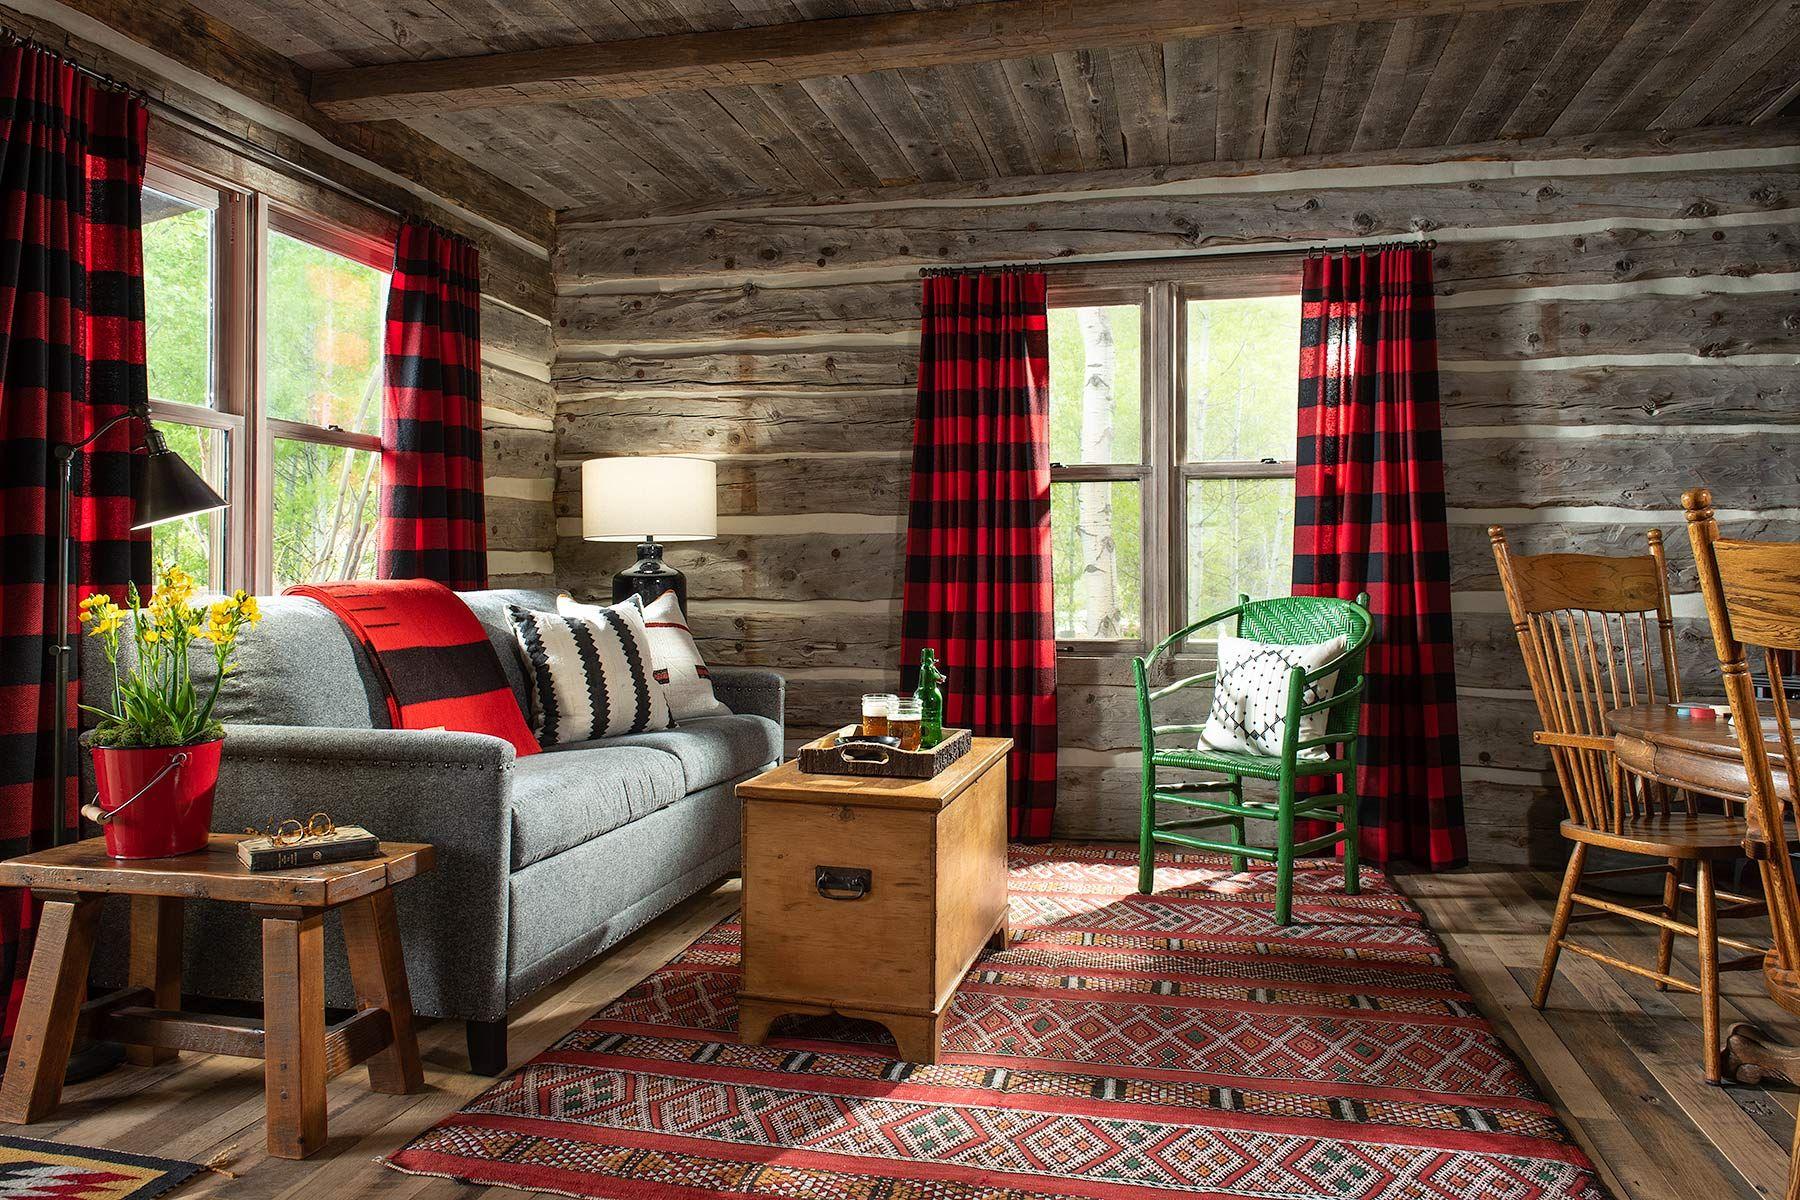 Homestead Cabin Renewal